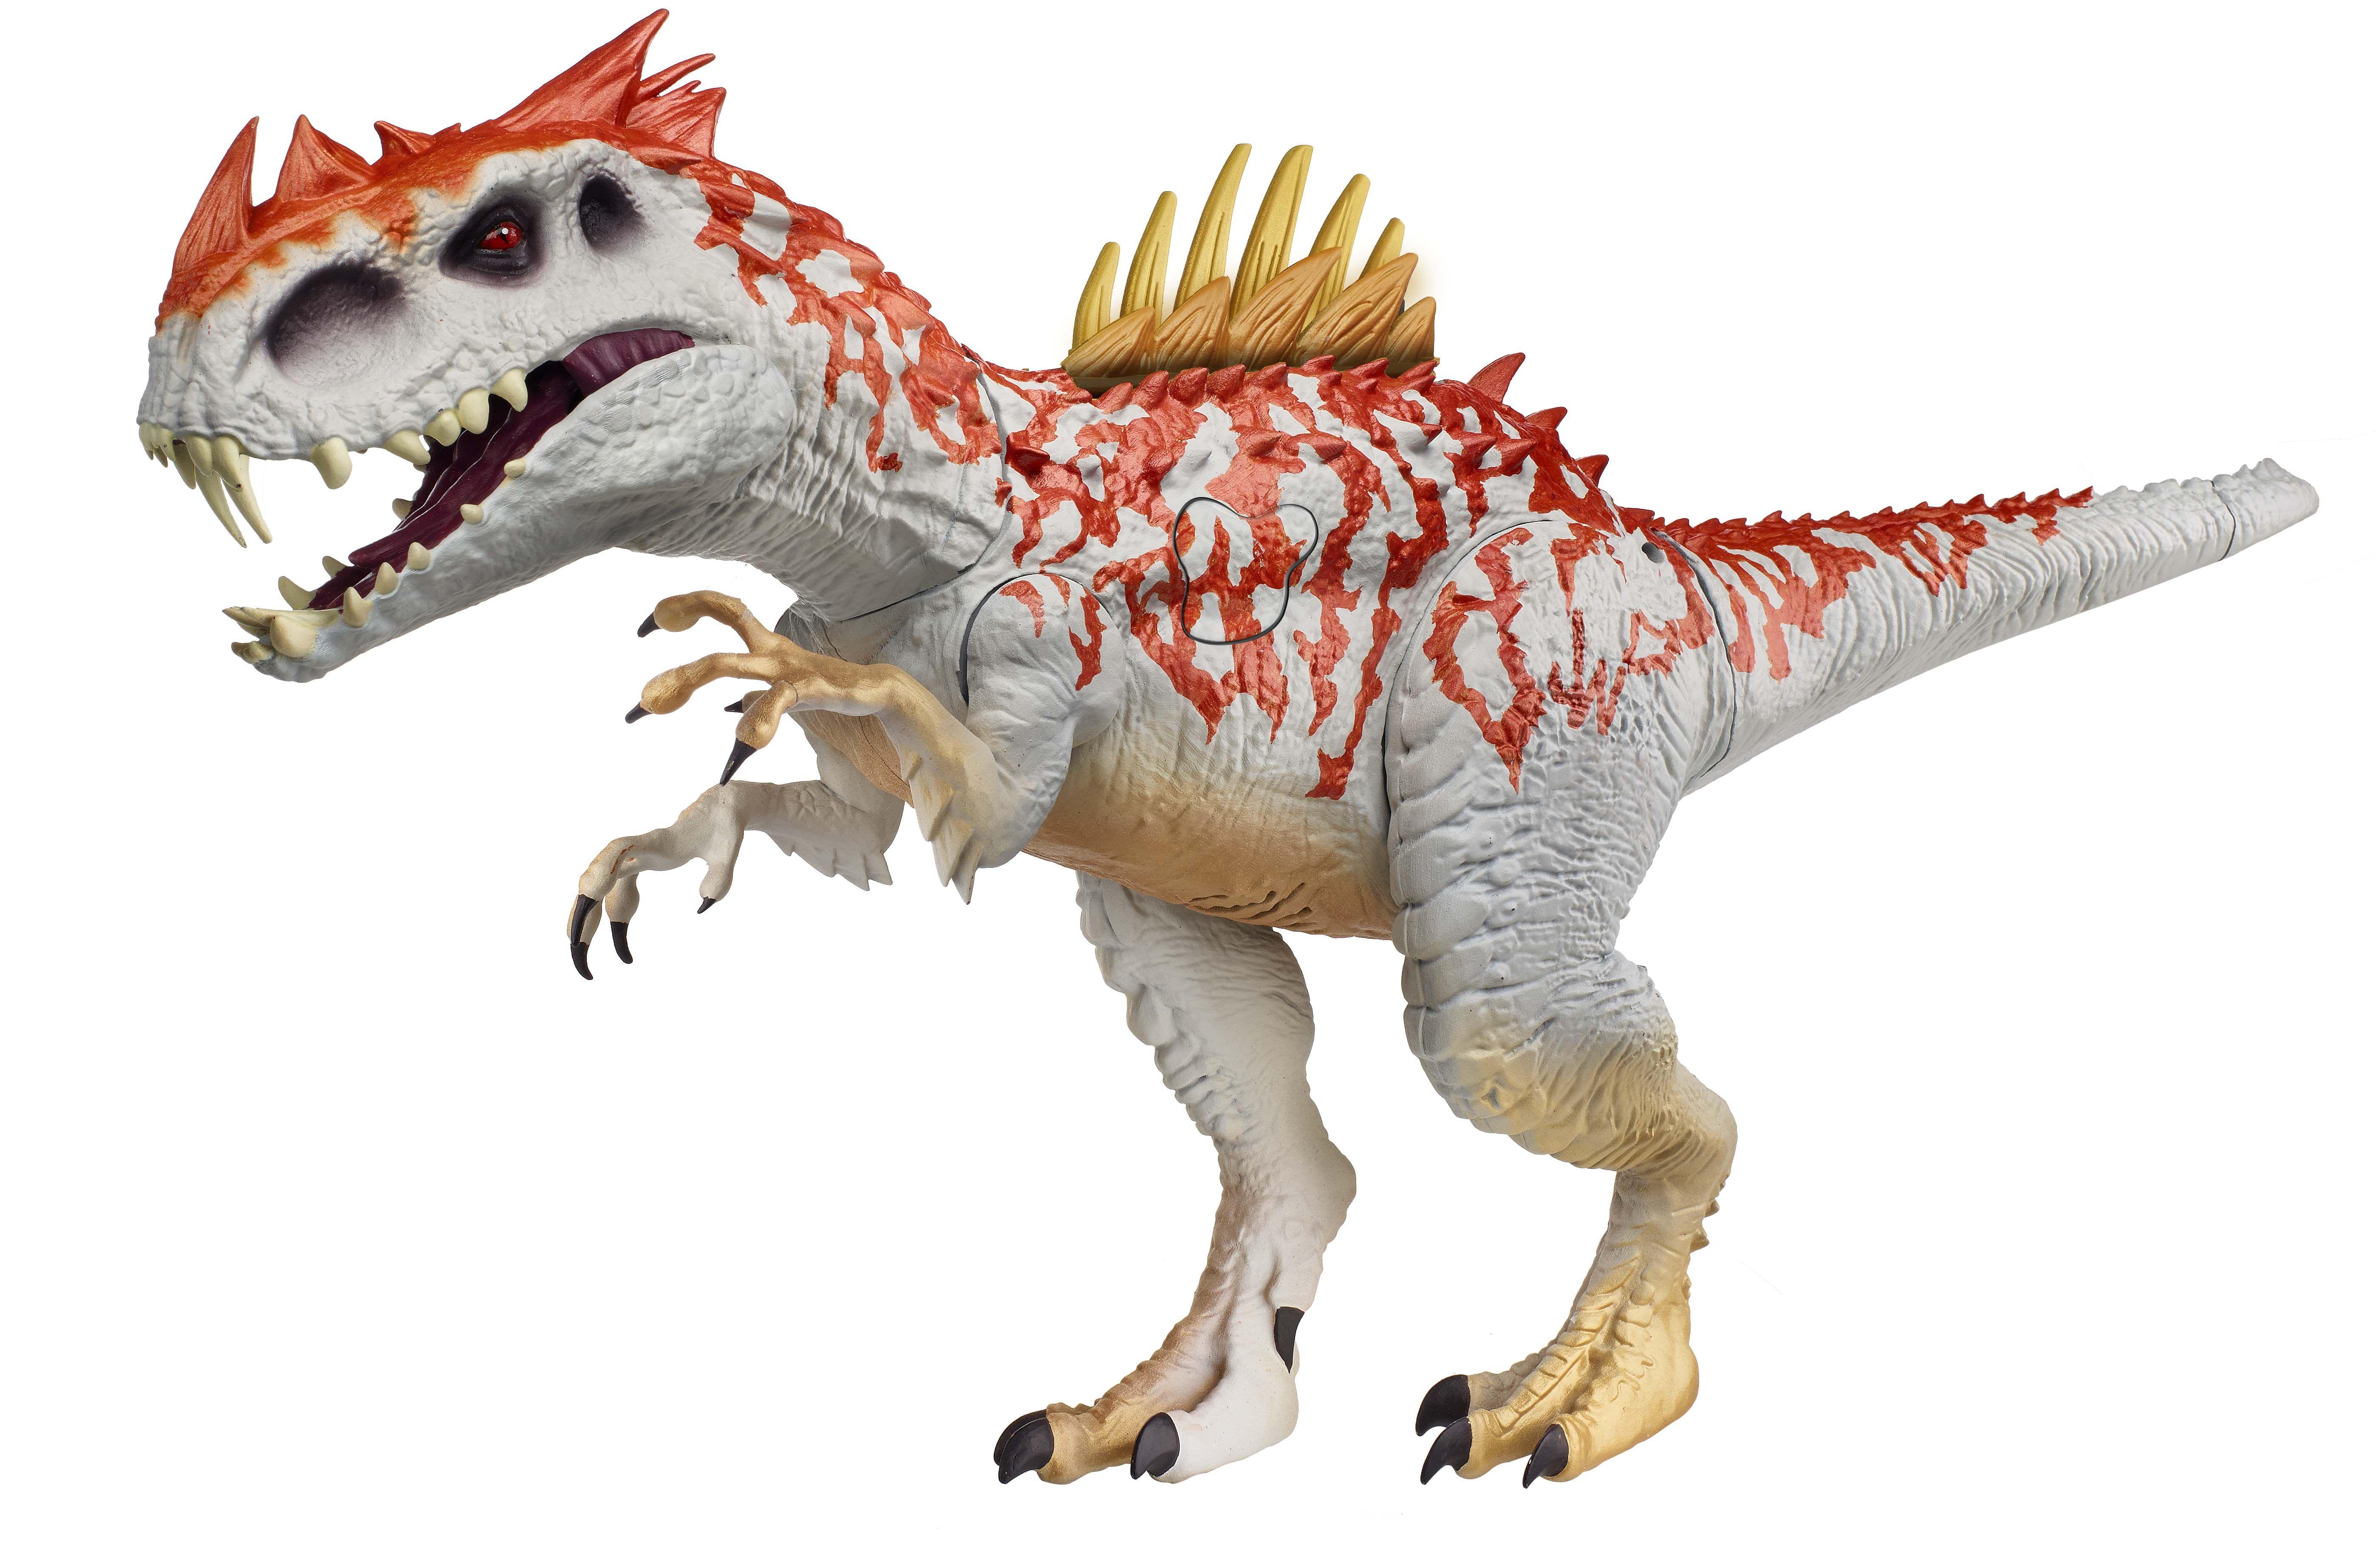 Jurassic World Jurassic Park Toys Jurassic World Hybrid Indominus Rex